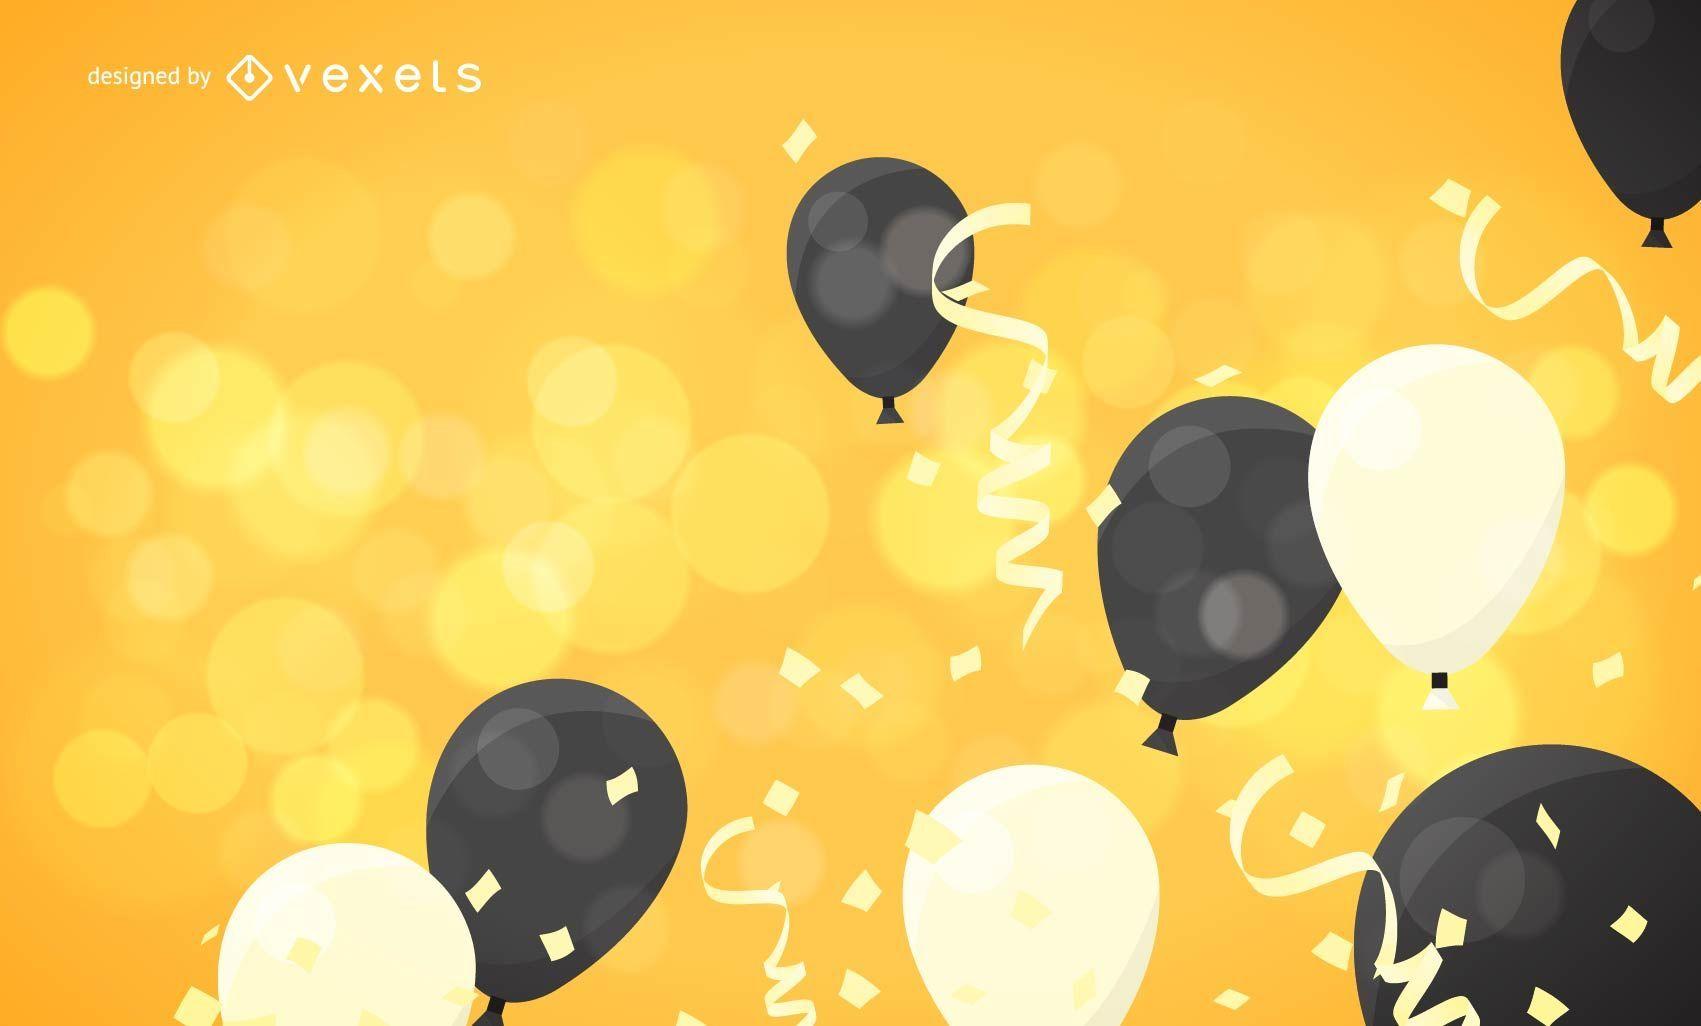 Ilustraci?n de celebraci?n con globo y cinta